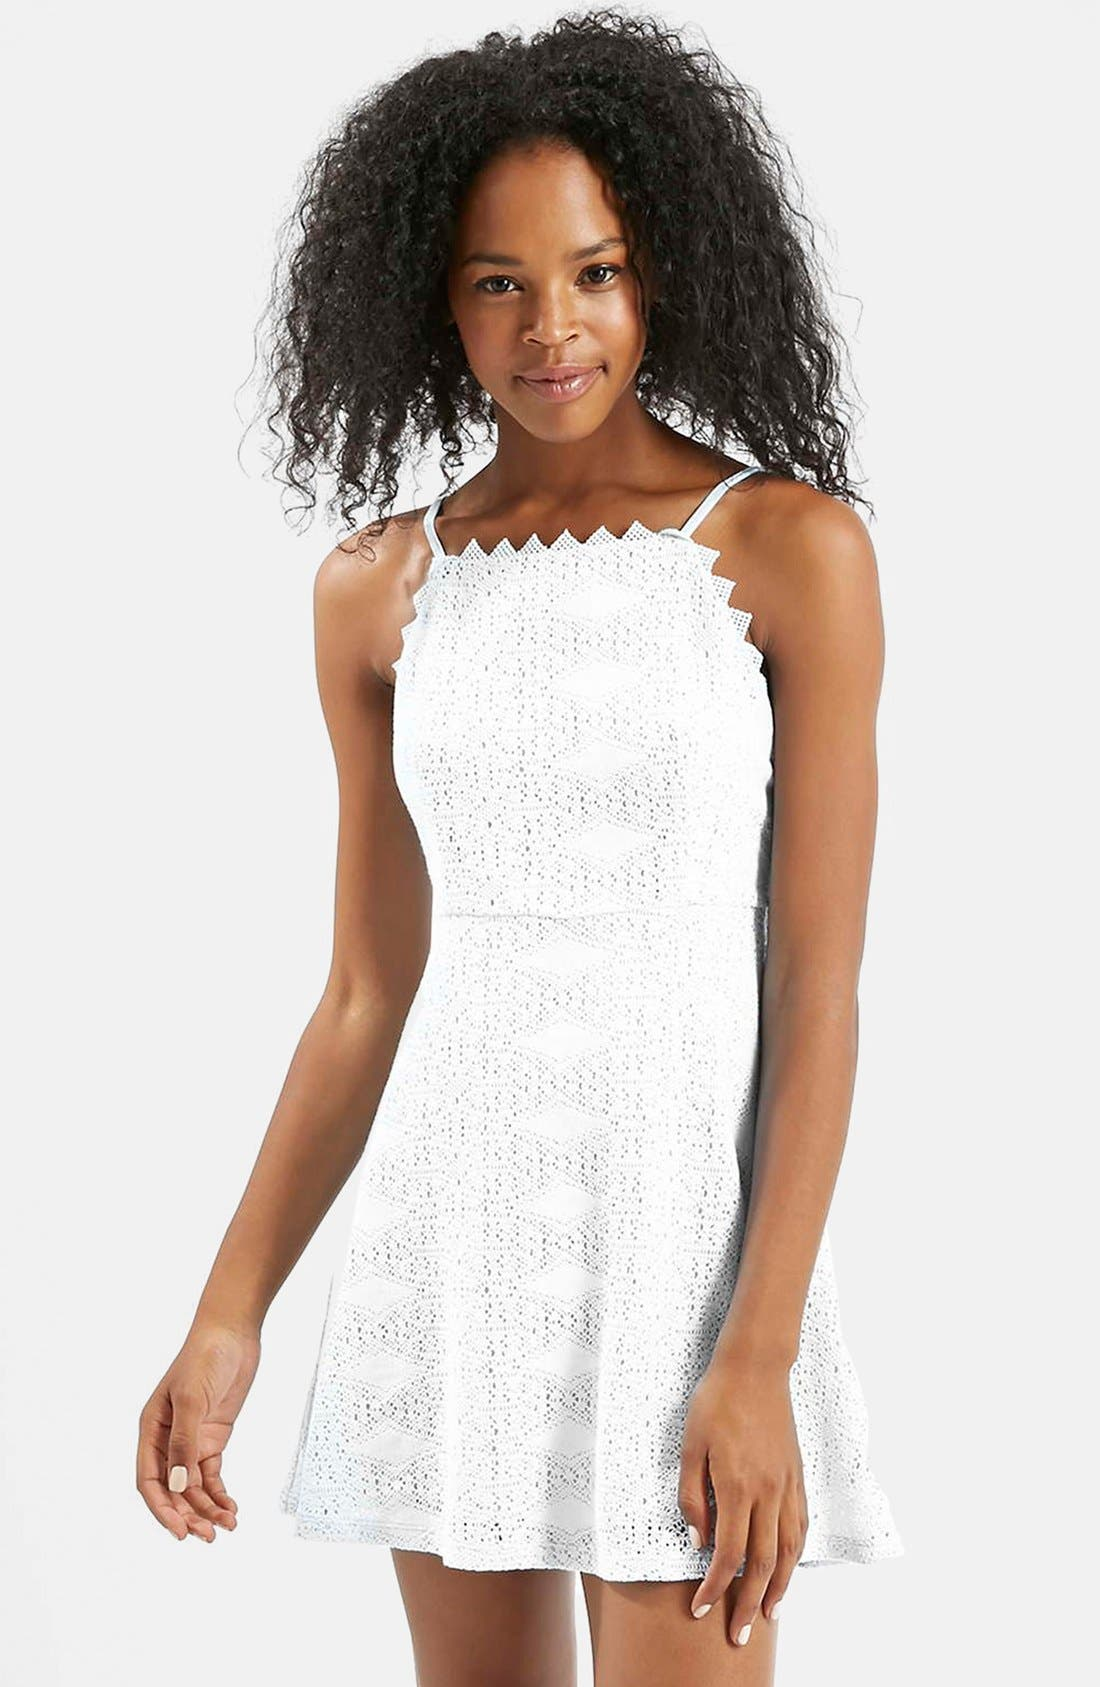 TOPSHOP,                             Crochet Dress,                             Alternate thumbnail 5, color,                             900